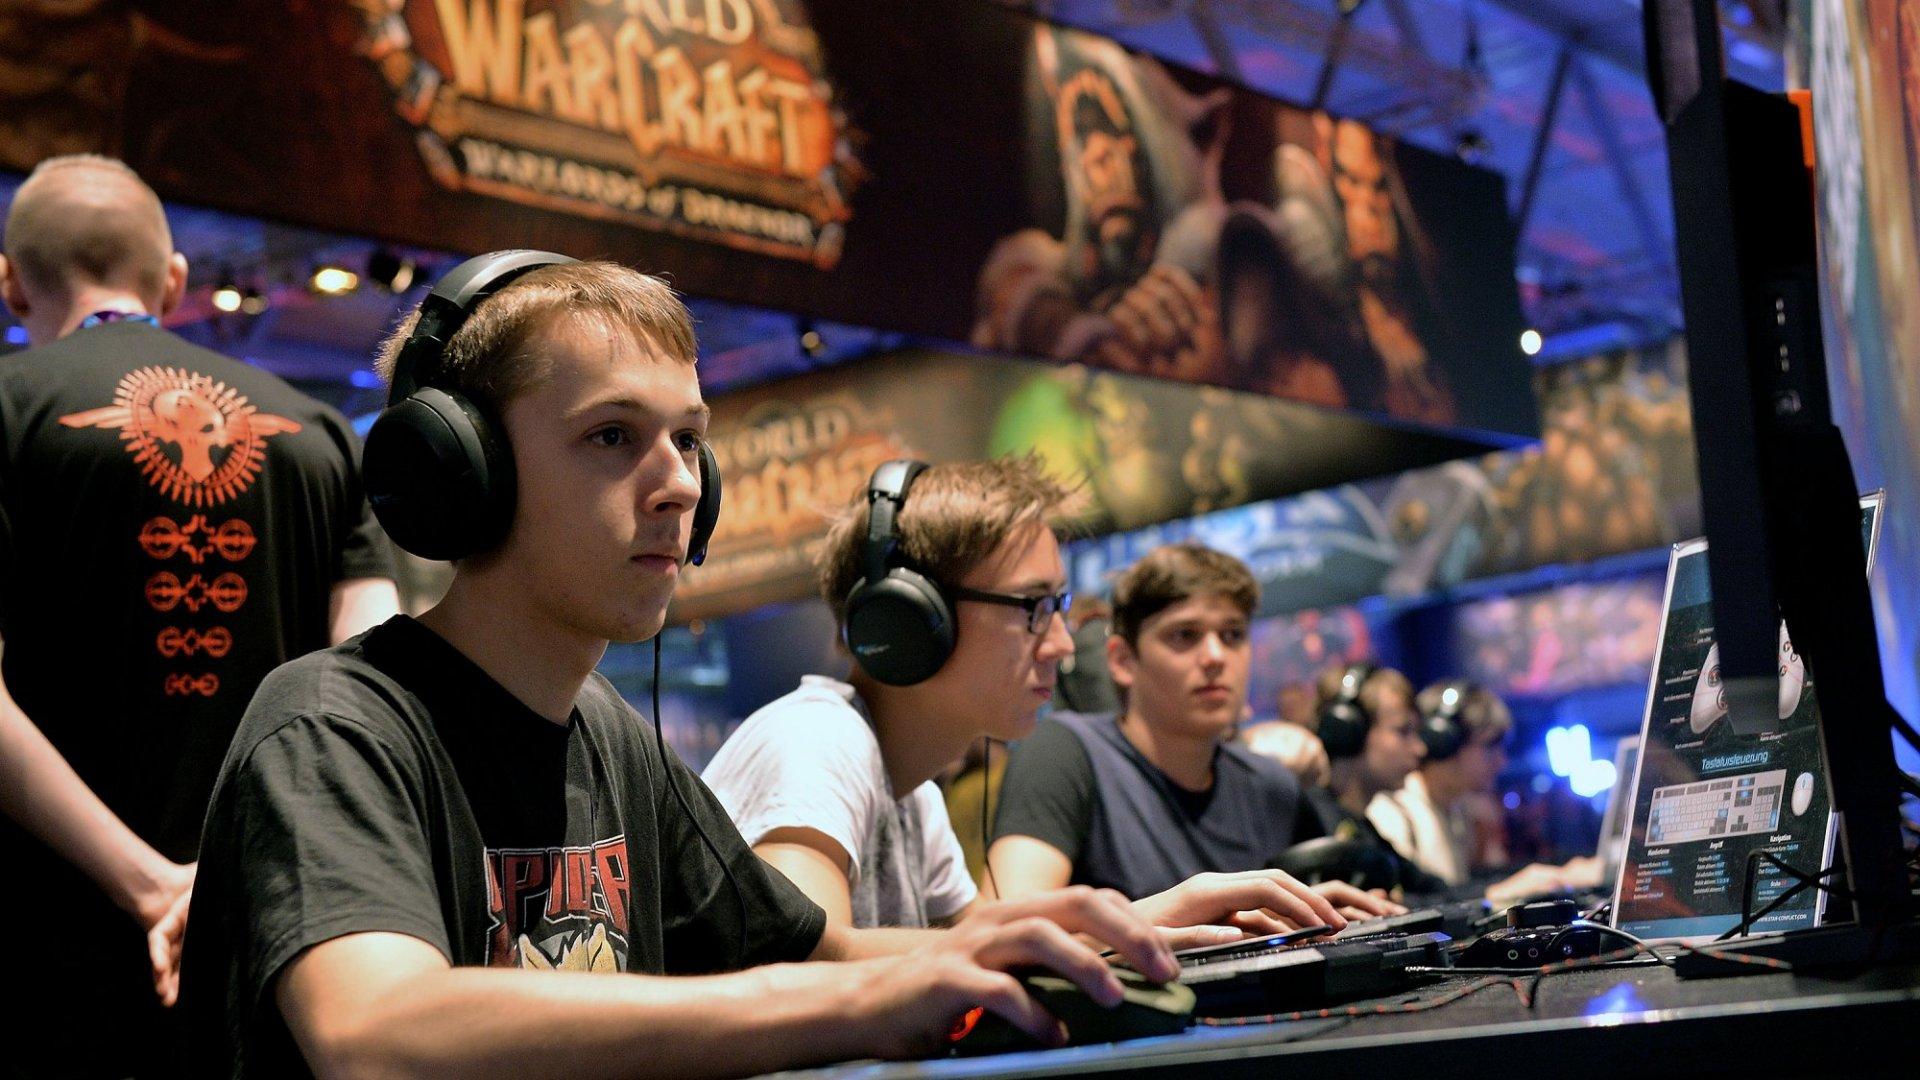 10 Ways The World of Warcraft Is Identical To The World Of Entrepreneurship